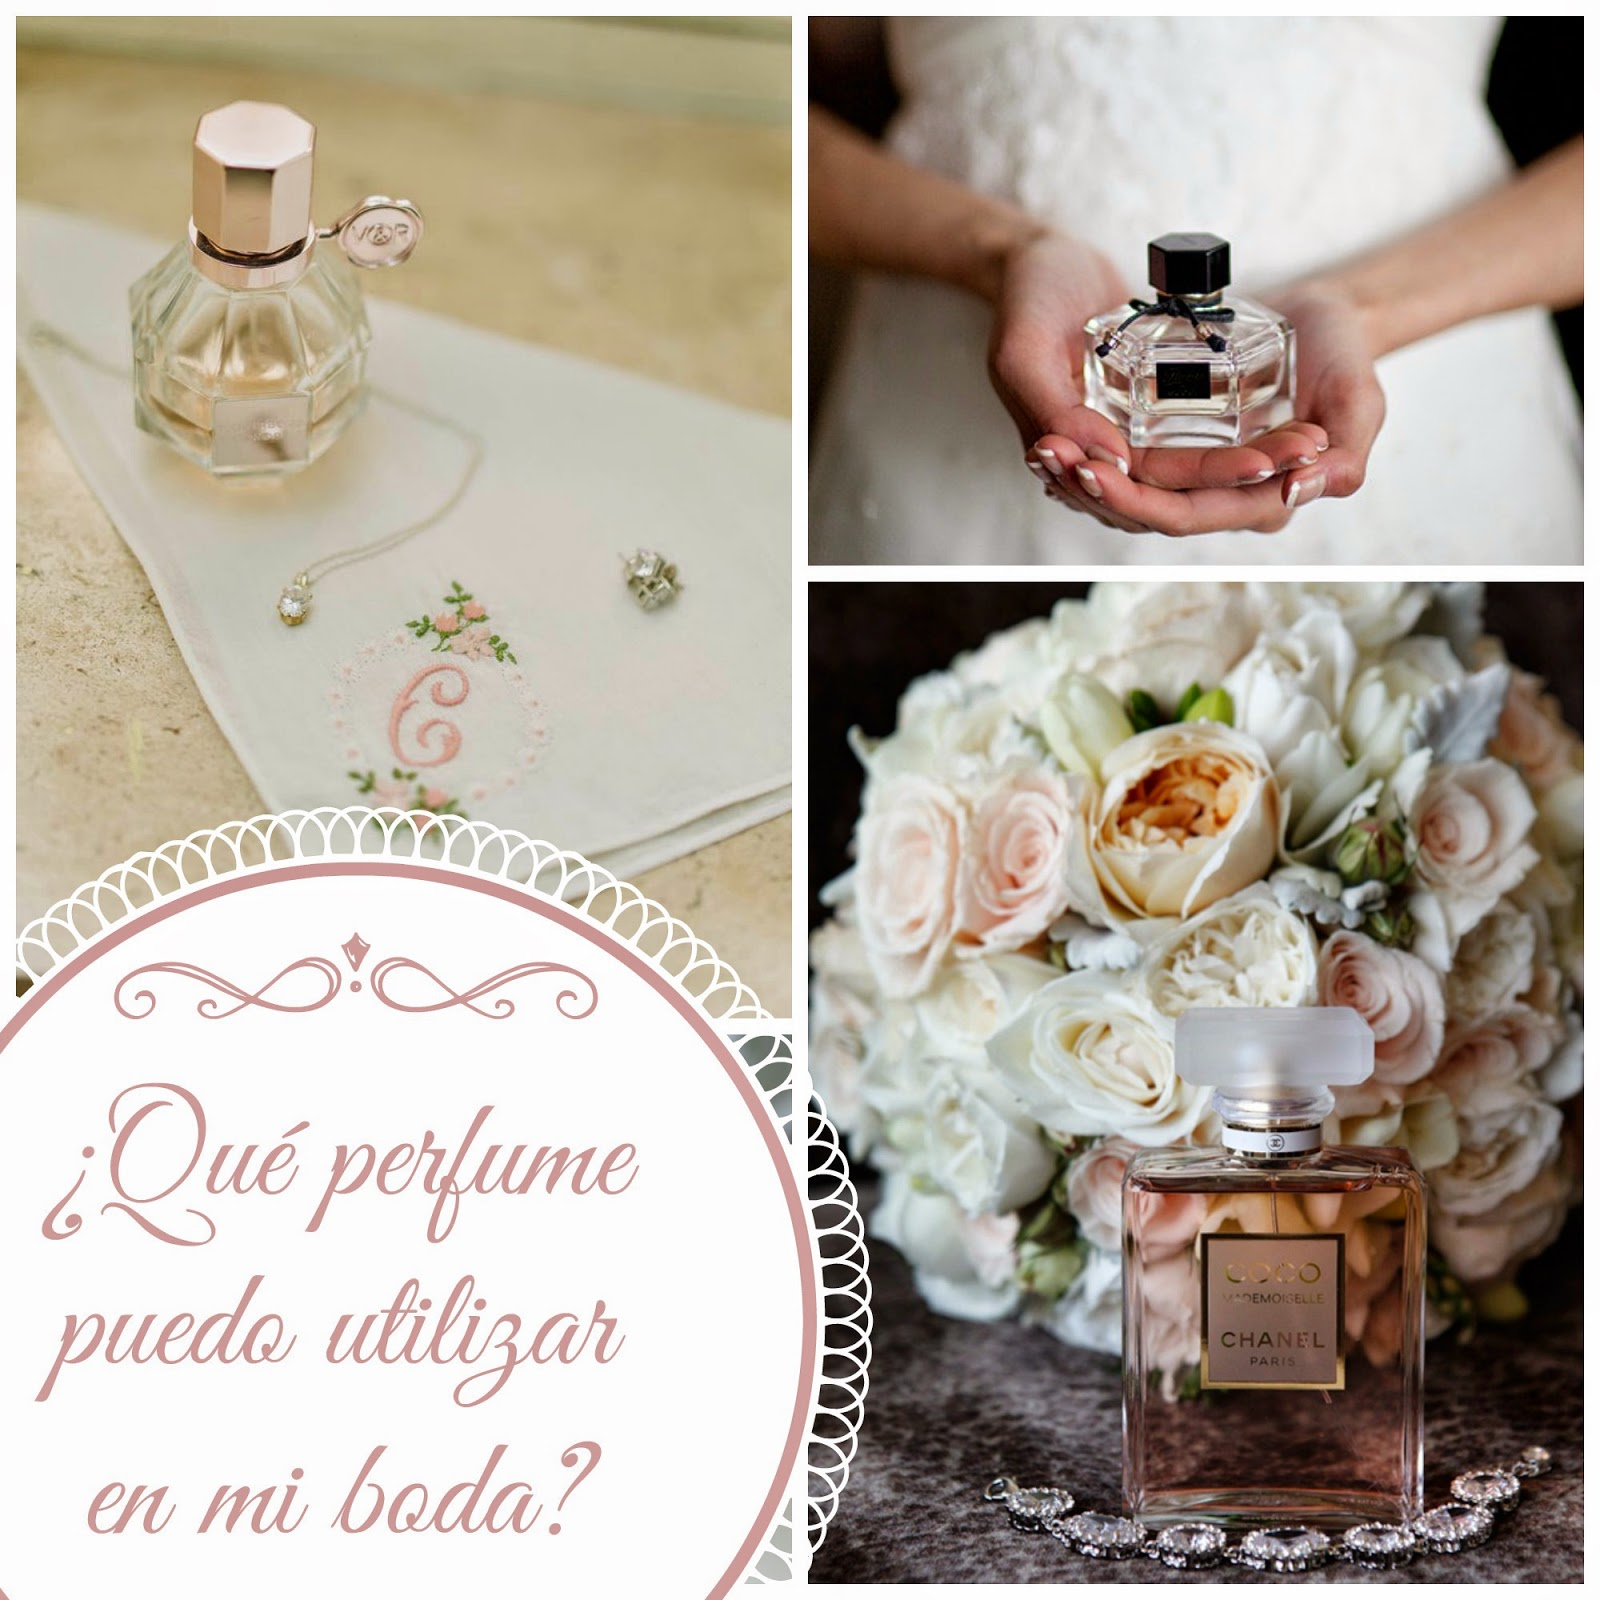 perfume para mi boda blog bodas mi boda gratis